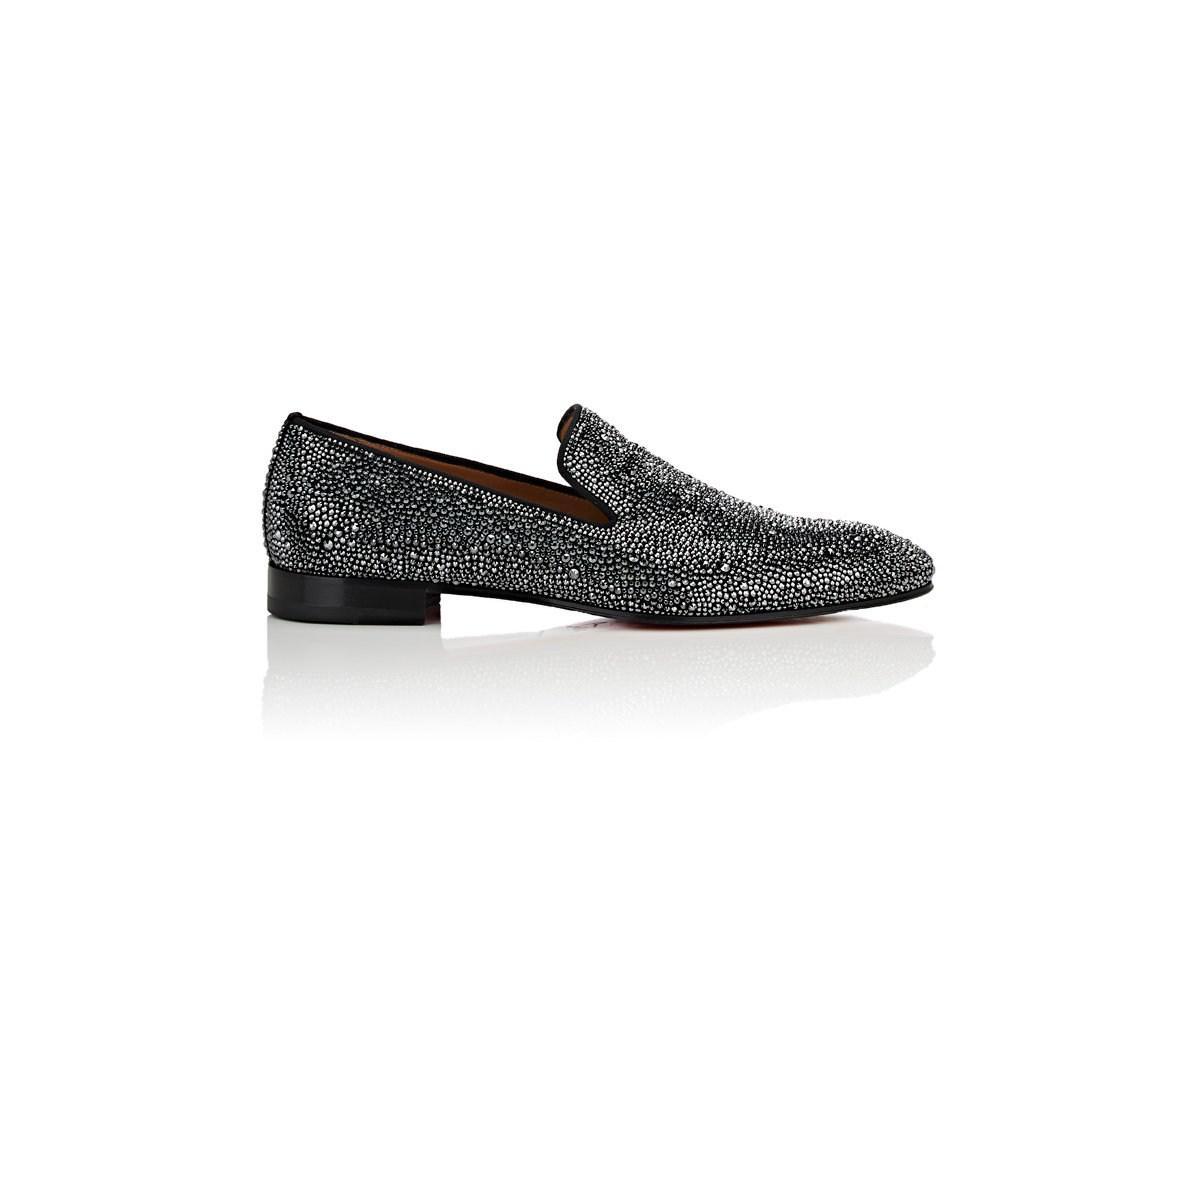 ce2c48fc0196e6 Lyst - Christian Louboutin Dandelion Strass Suede Venetian Loafers ...